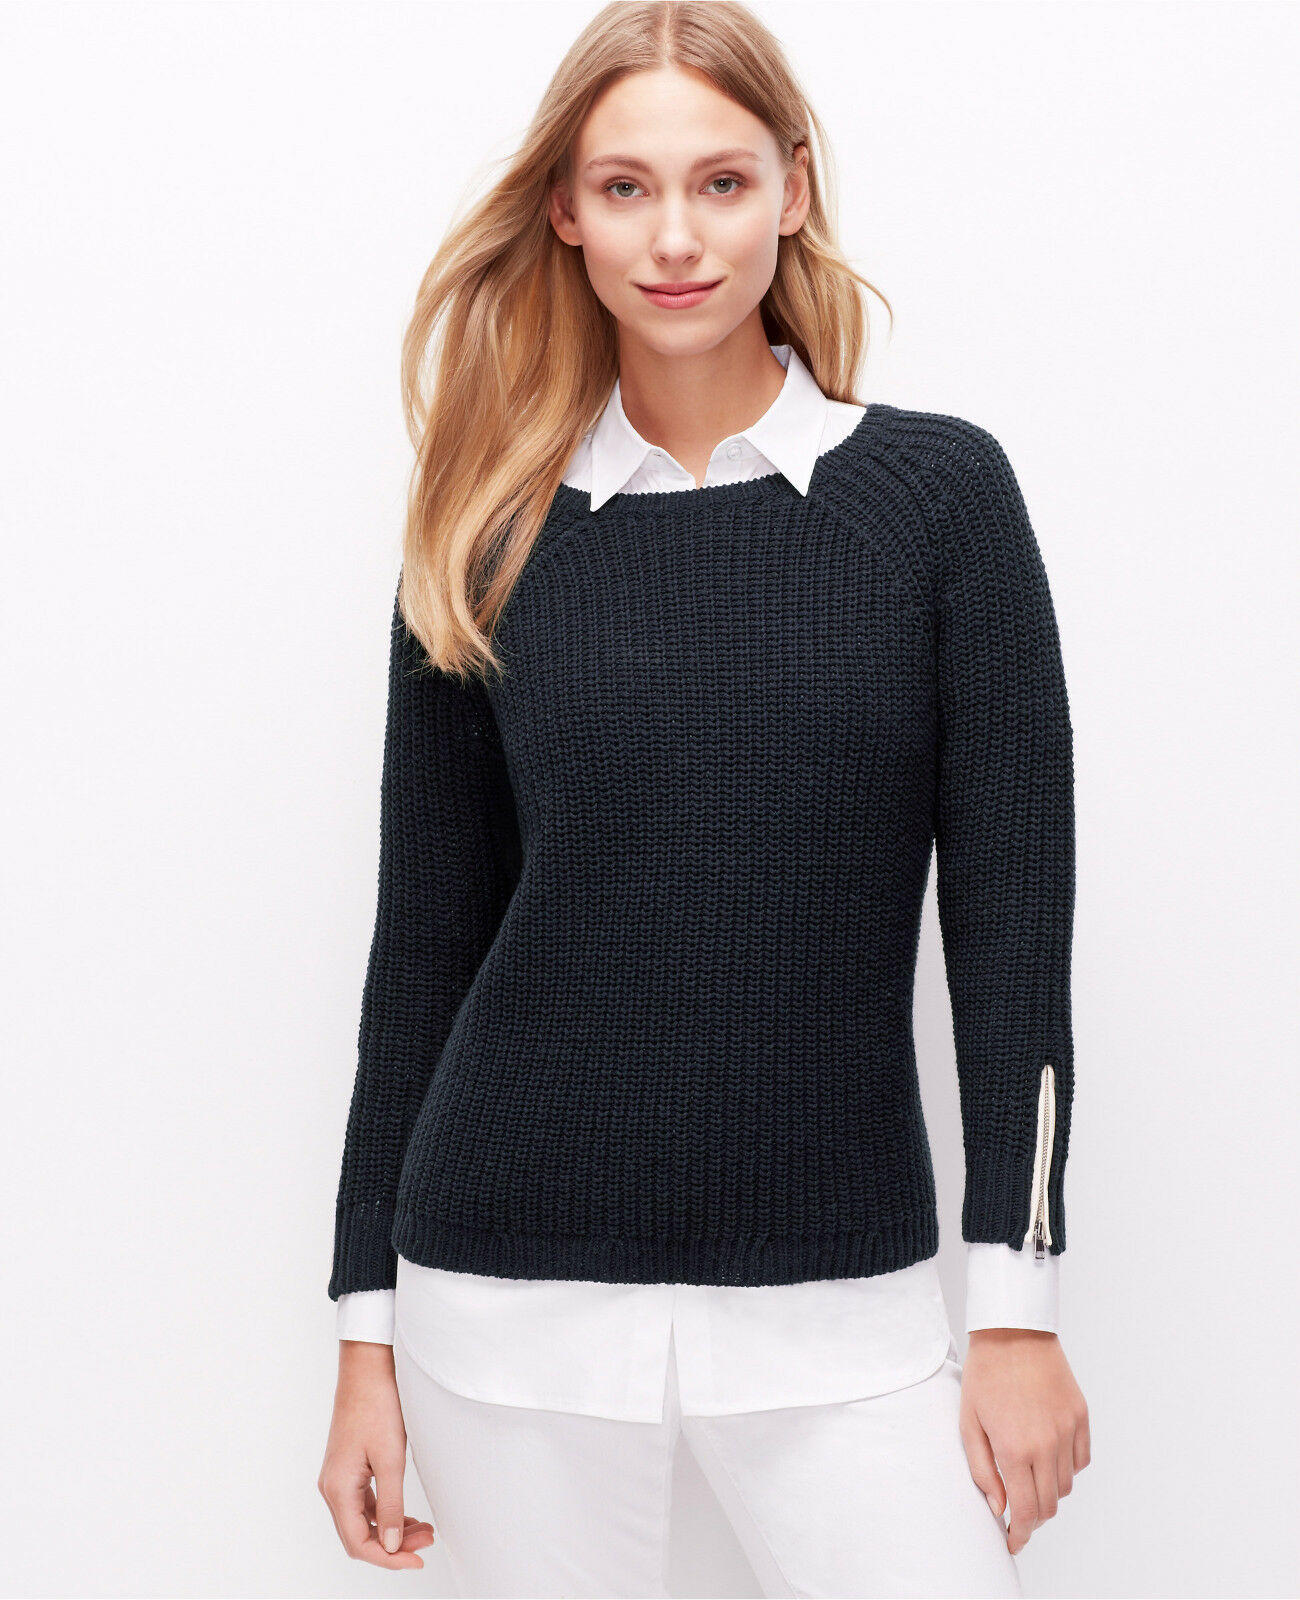 Ann Taylor - Woman's Medium (8-10) Dark Sky bluee Zip Cuff Sweater  (12)